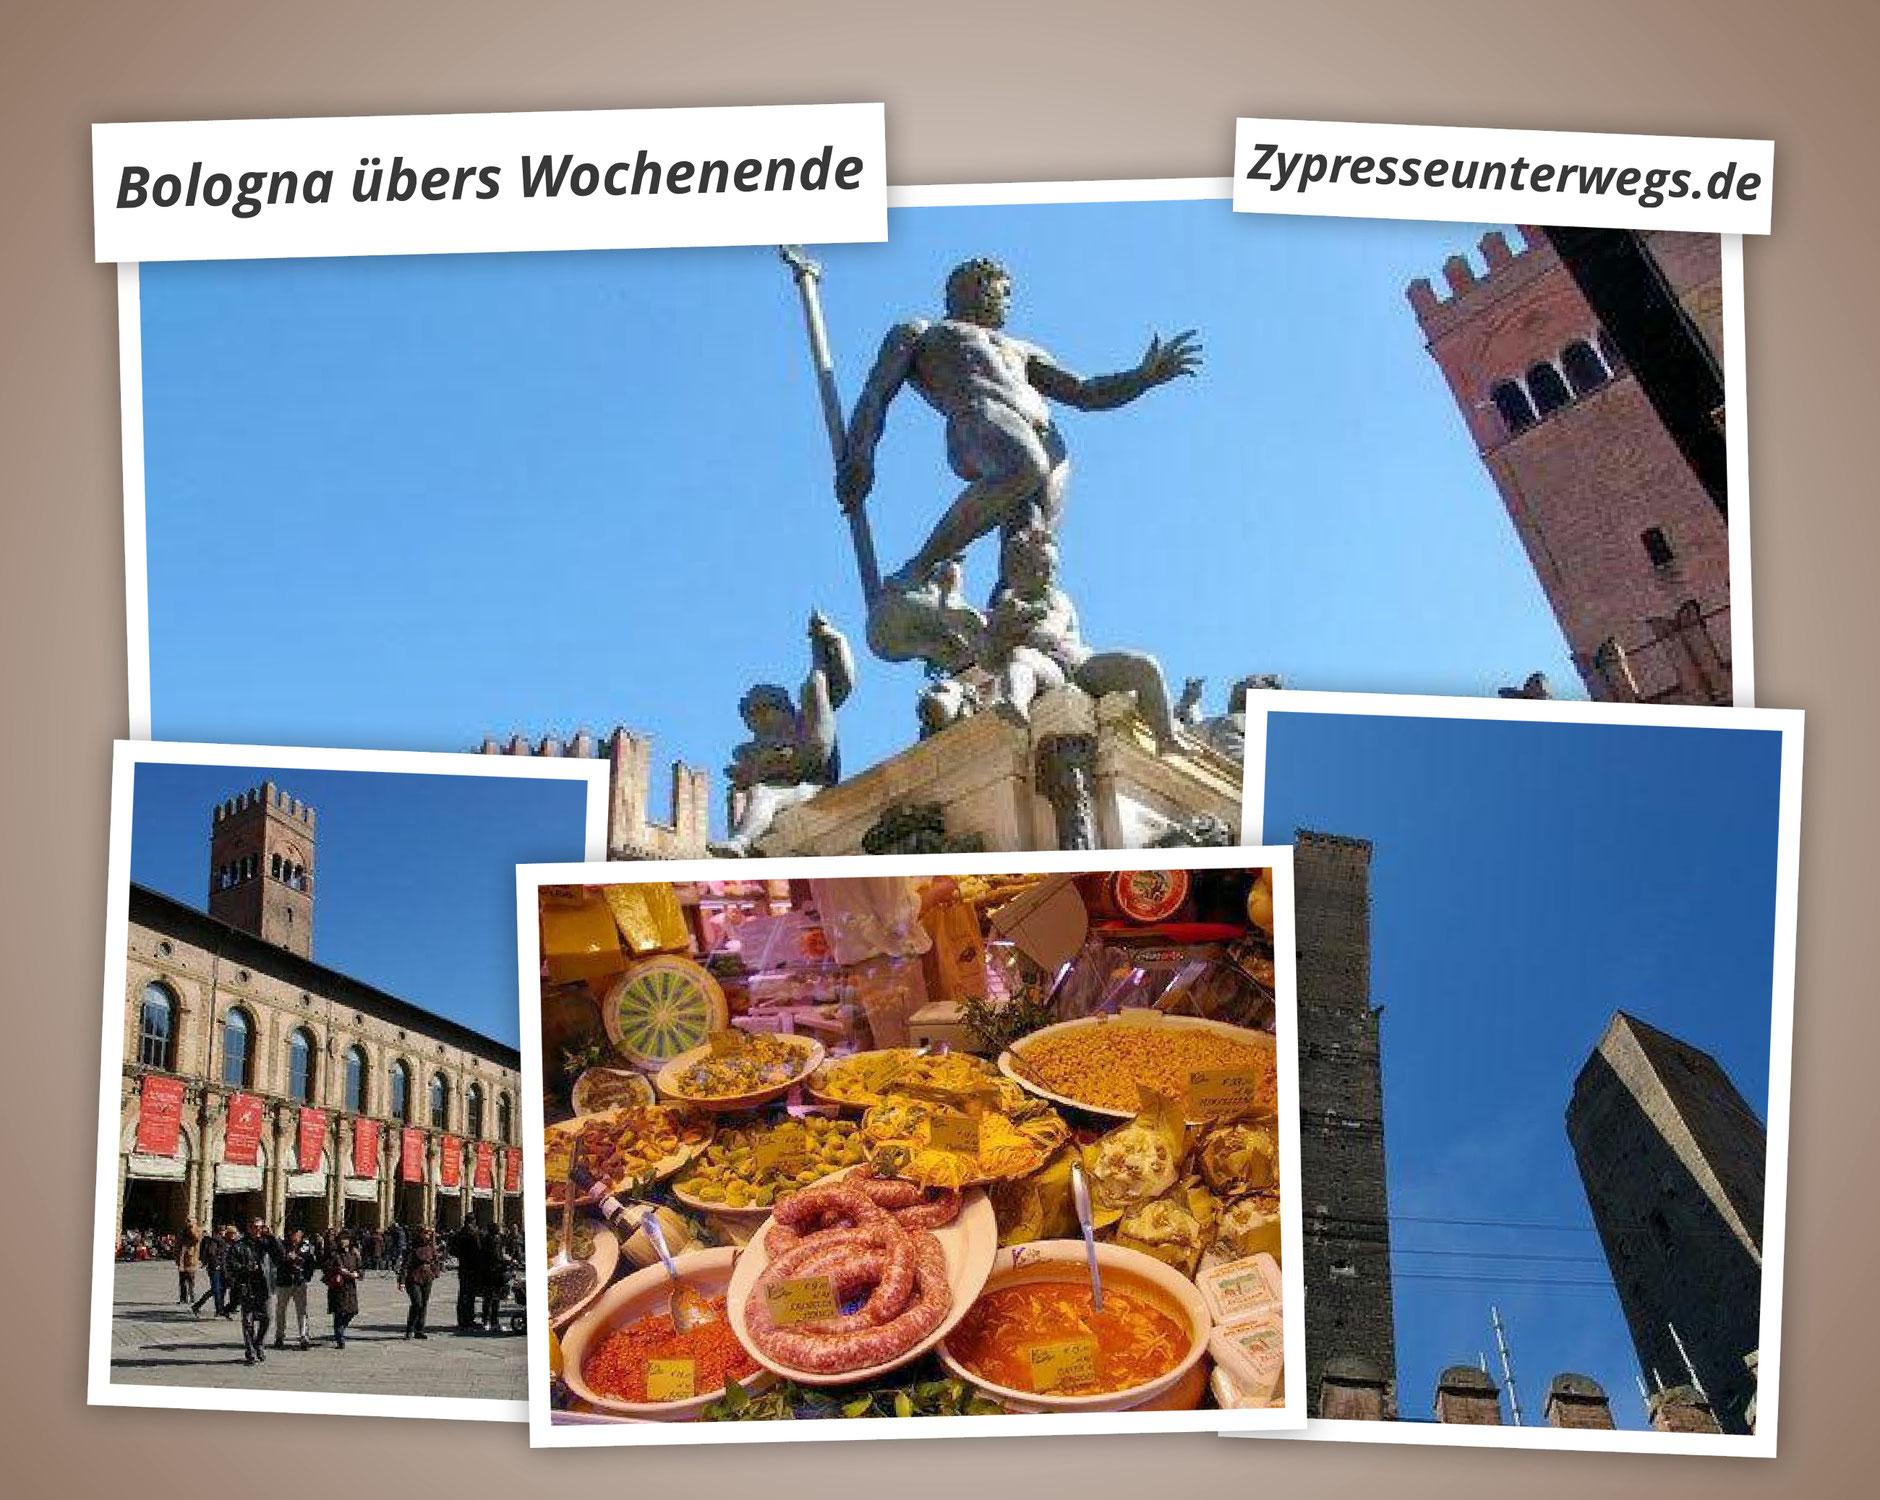 Bologna übers Wochenende